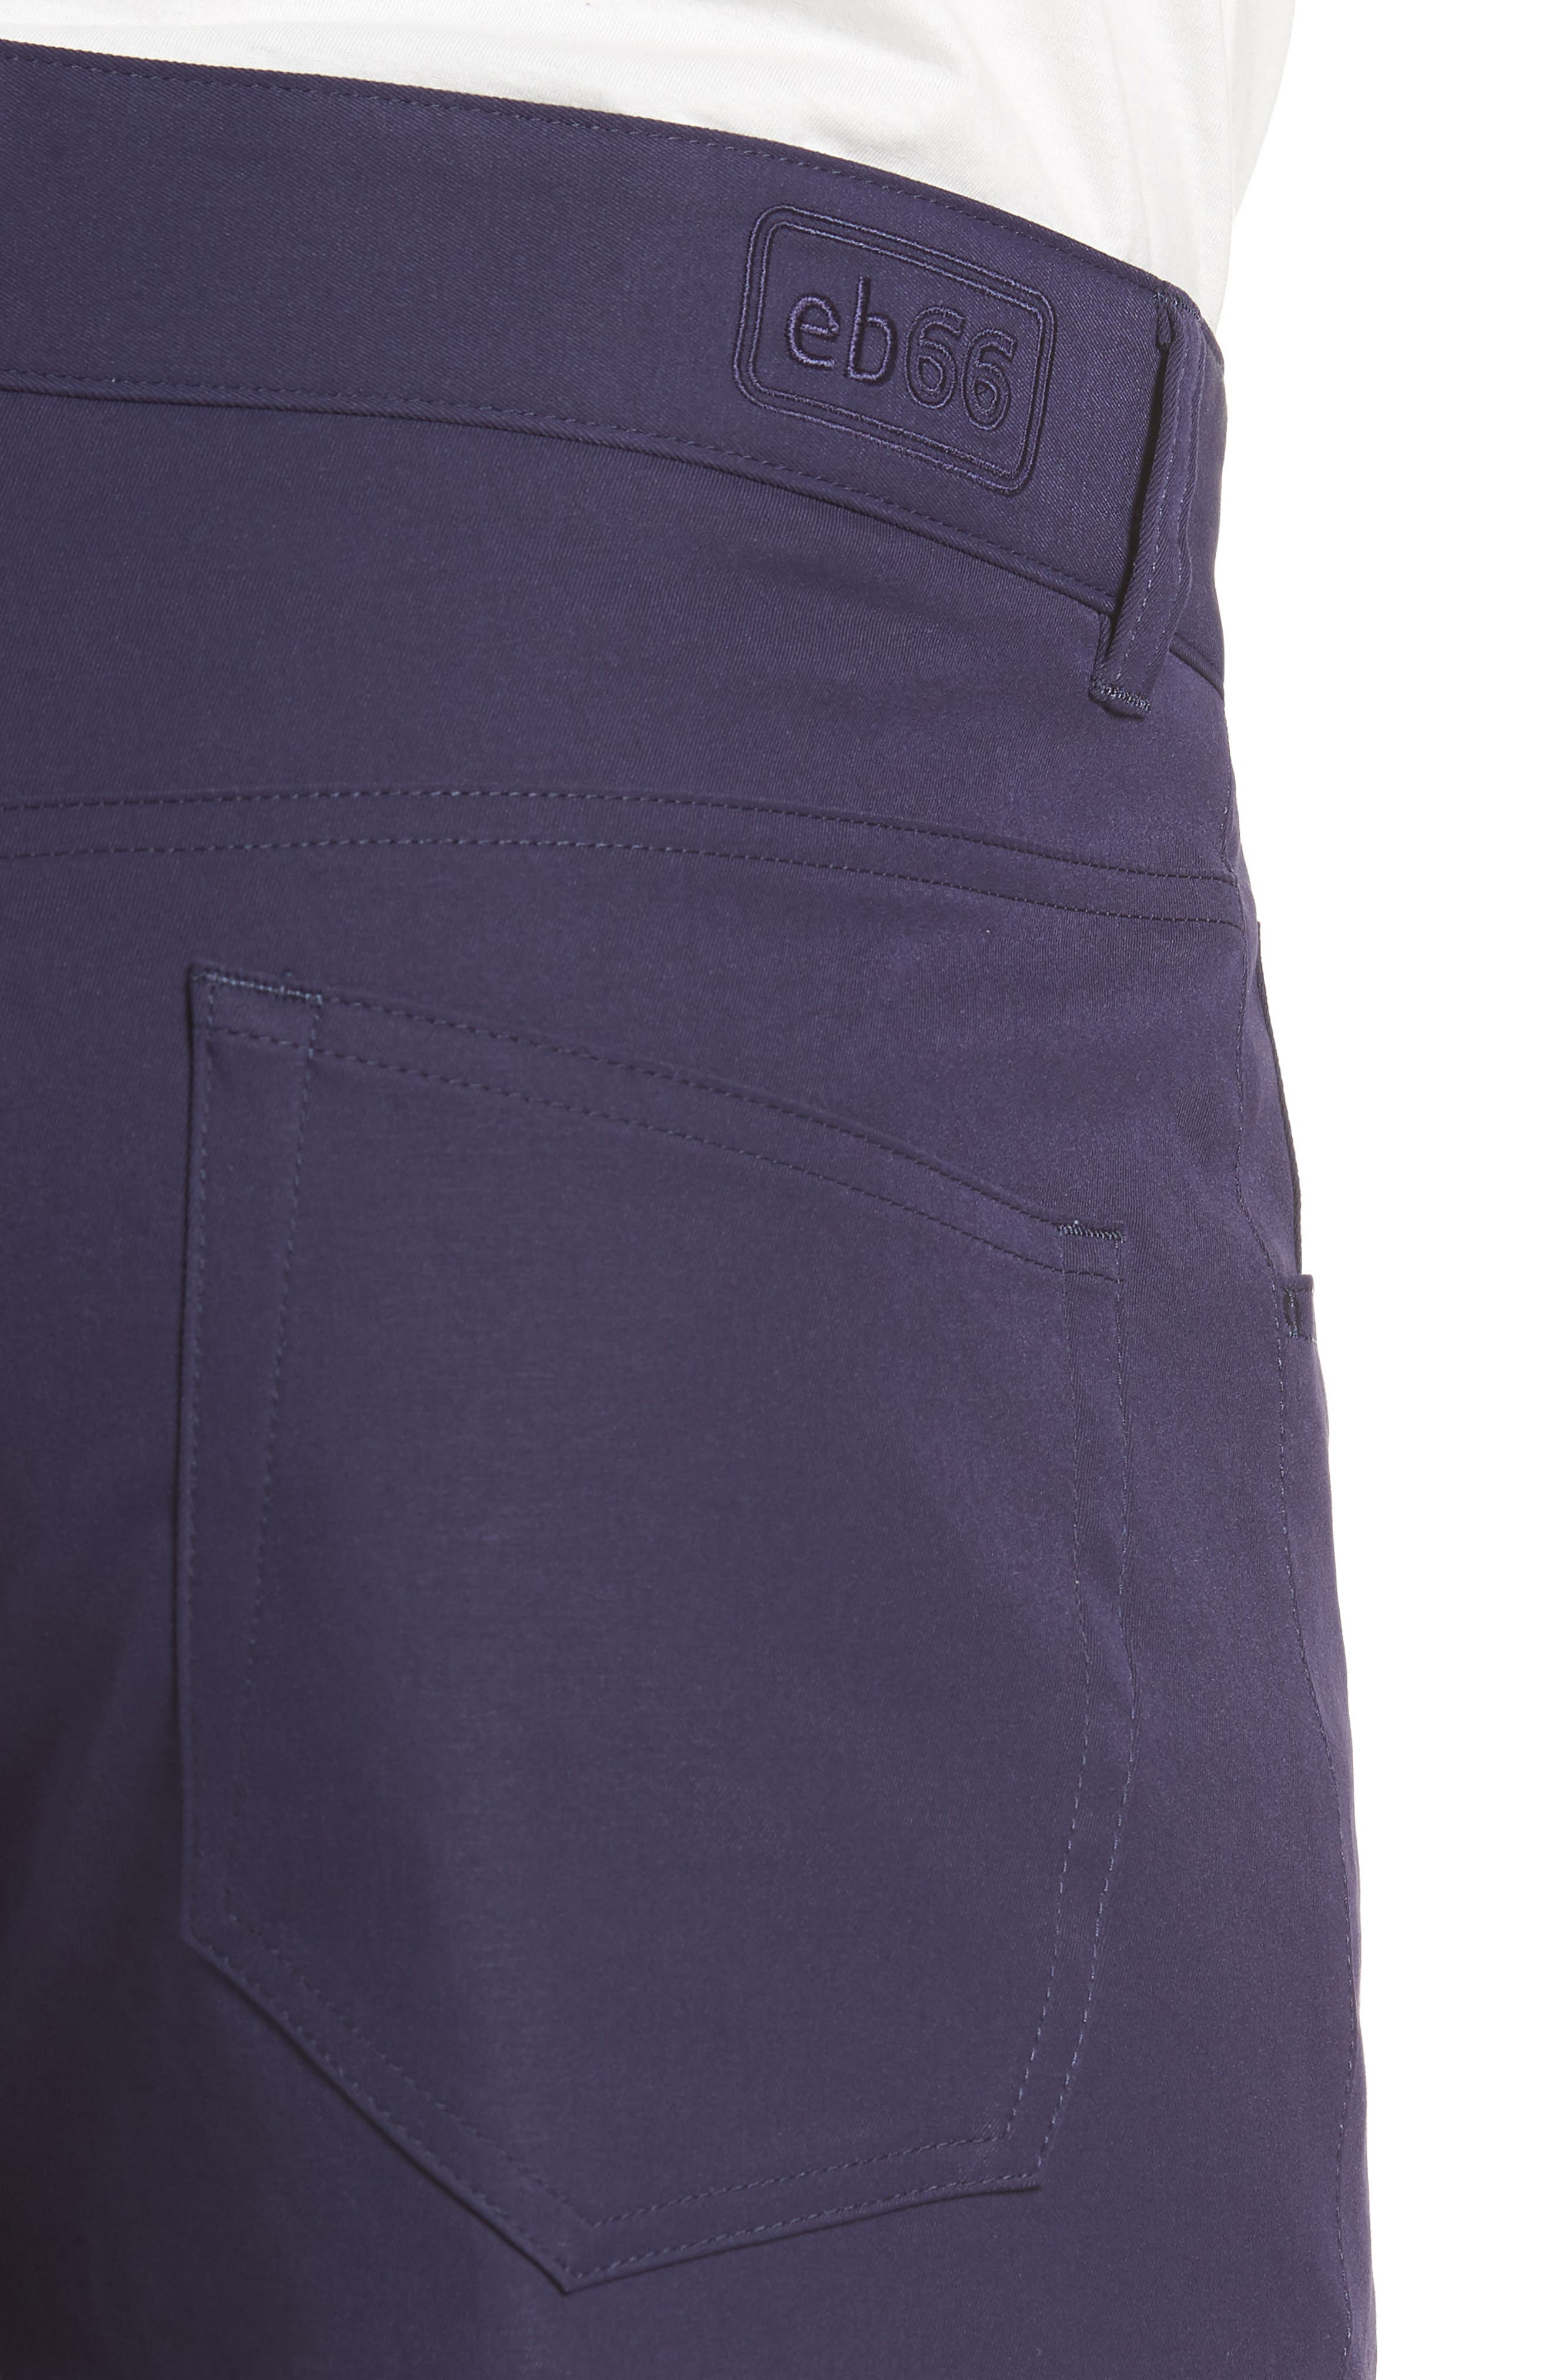 EB66 Performance Six-Pocket Pants,                             Alternate thumbnail 23, color,